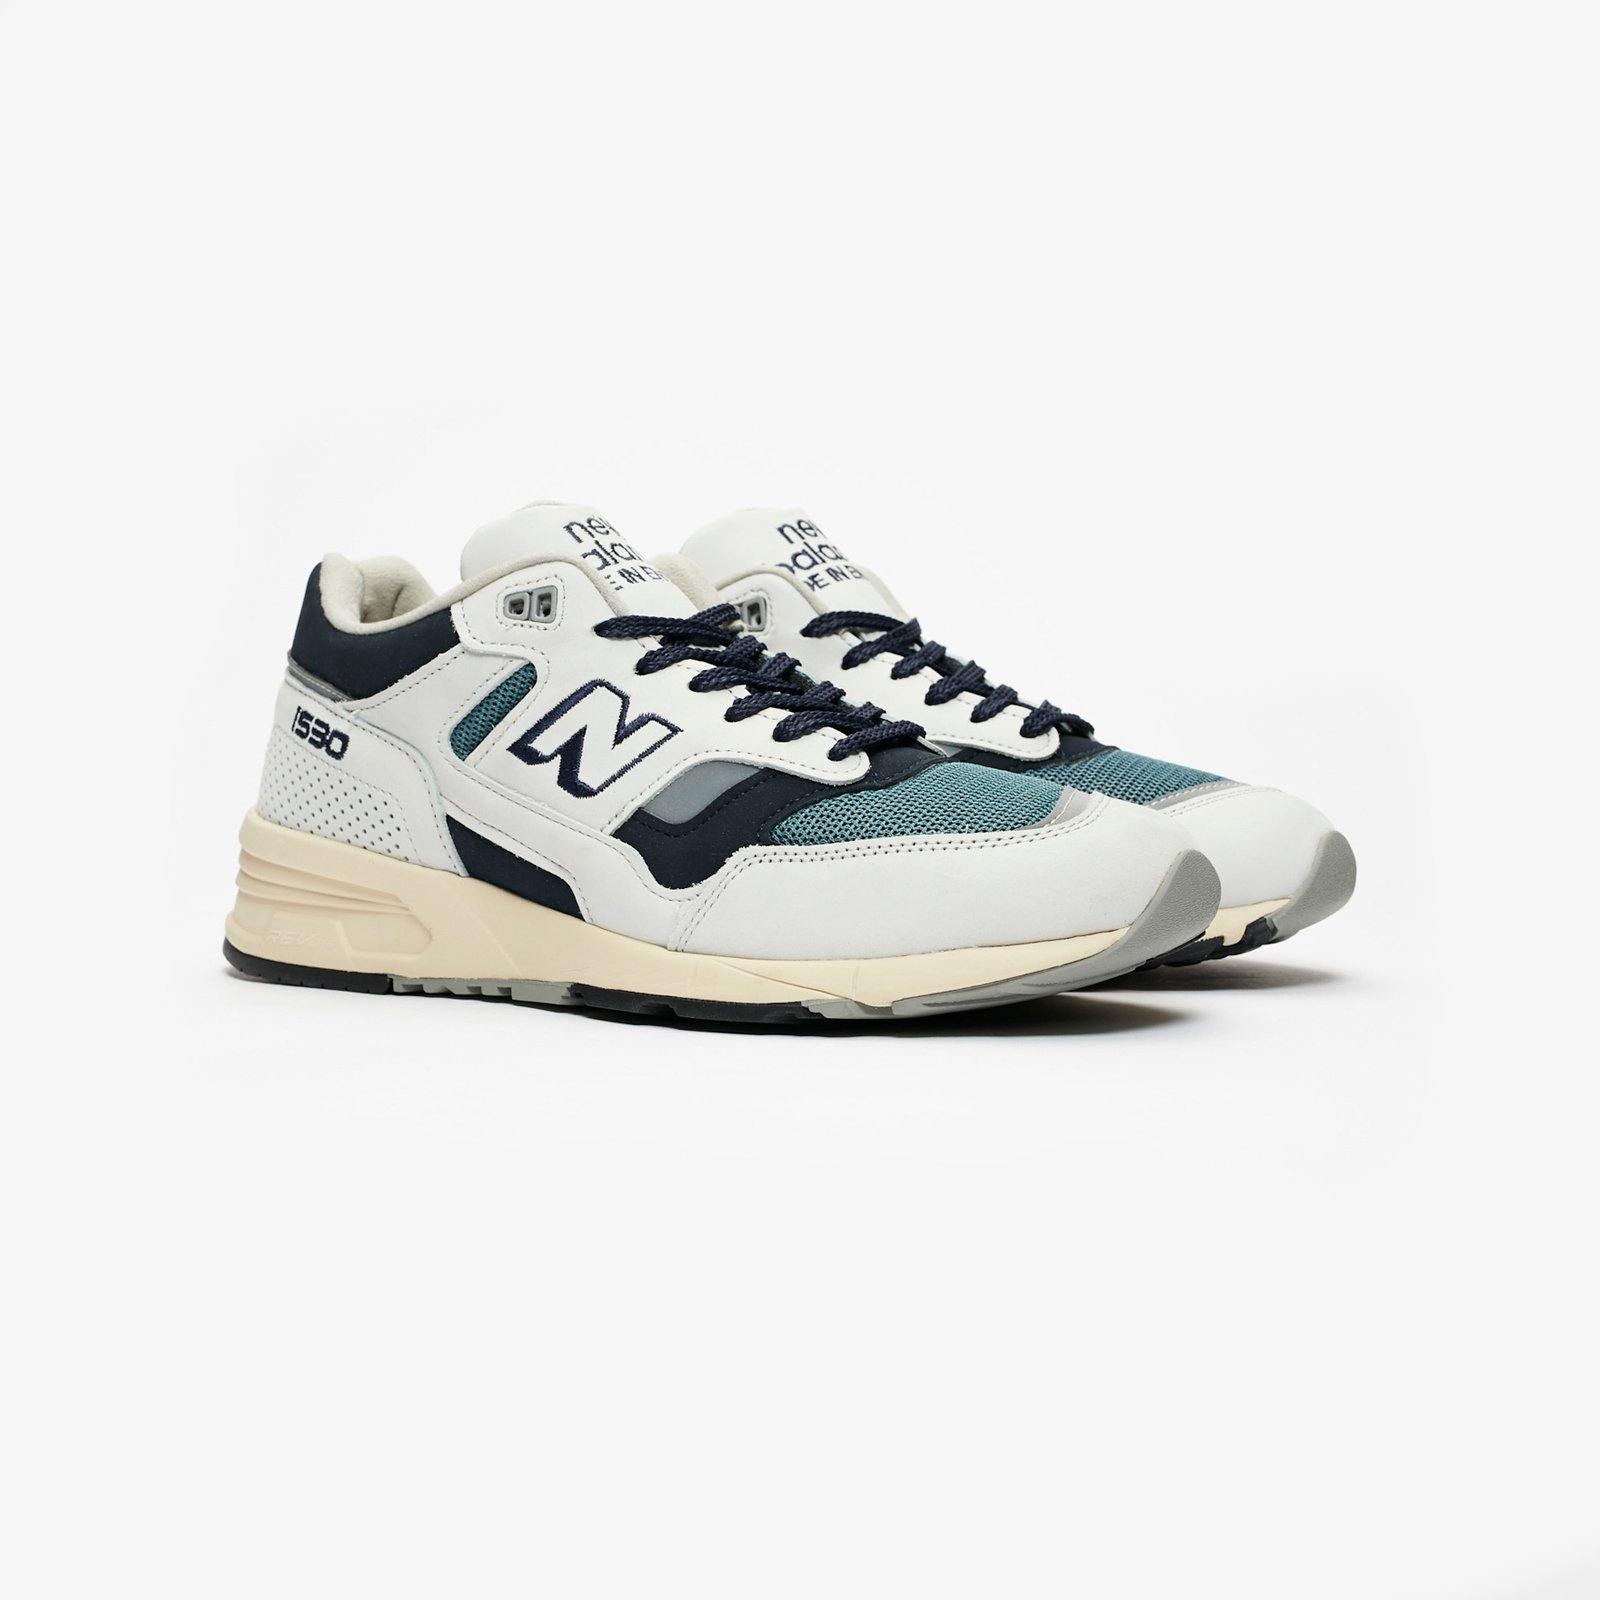 New Balance M1530 - M1530ogg - SNS | sneakers & streetwear online ...